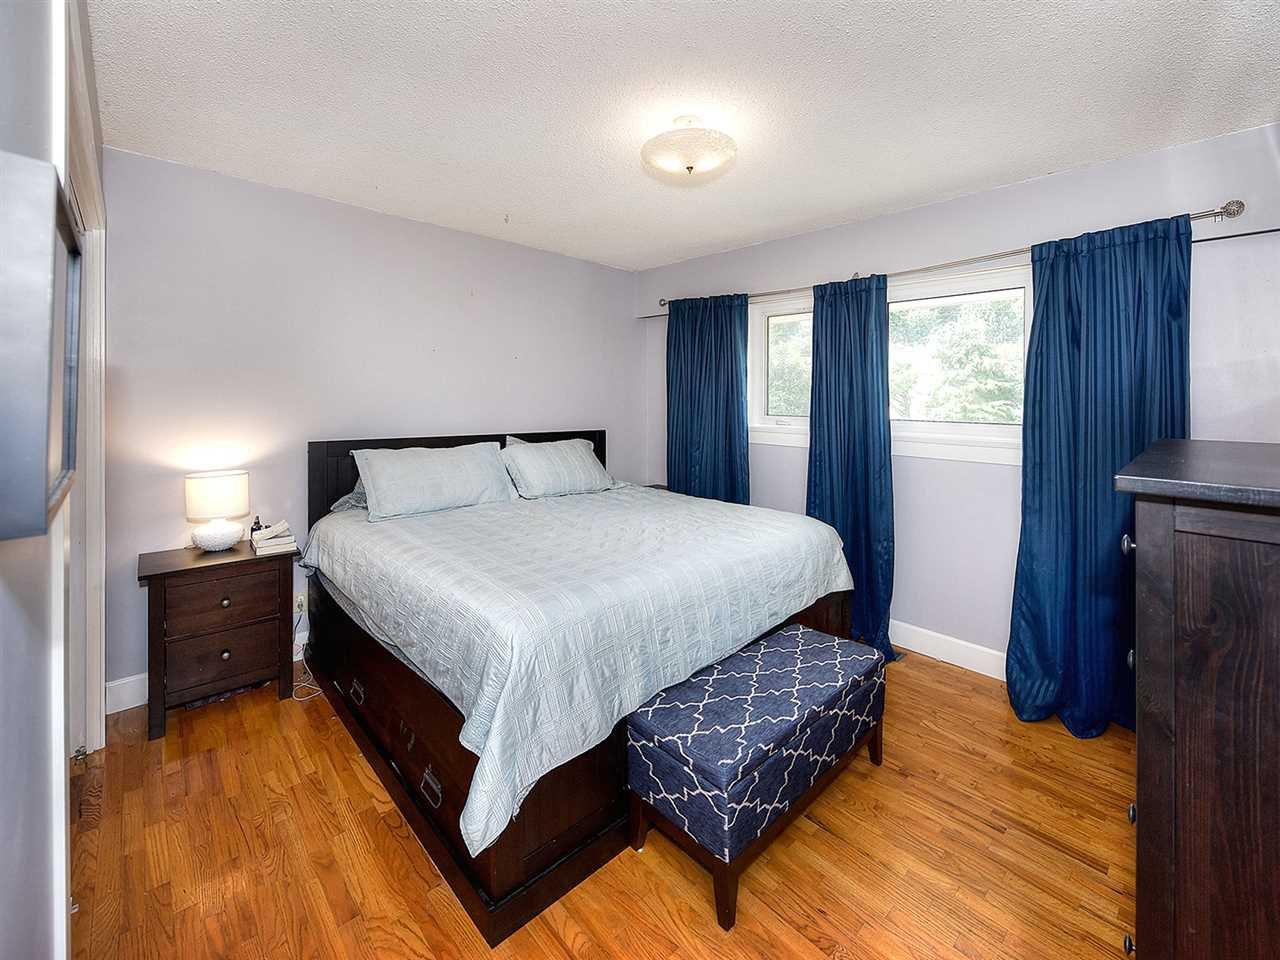 Photo 9: Photos: 1067 WILMINGTON Drive in Delta: Tsawwassen Central House for sale (Tsawwassen)  : MLS®# R2090180